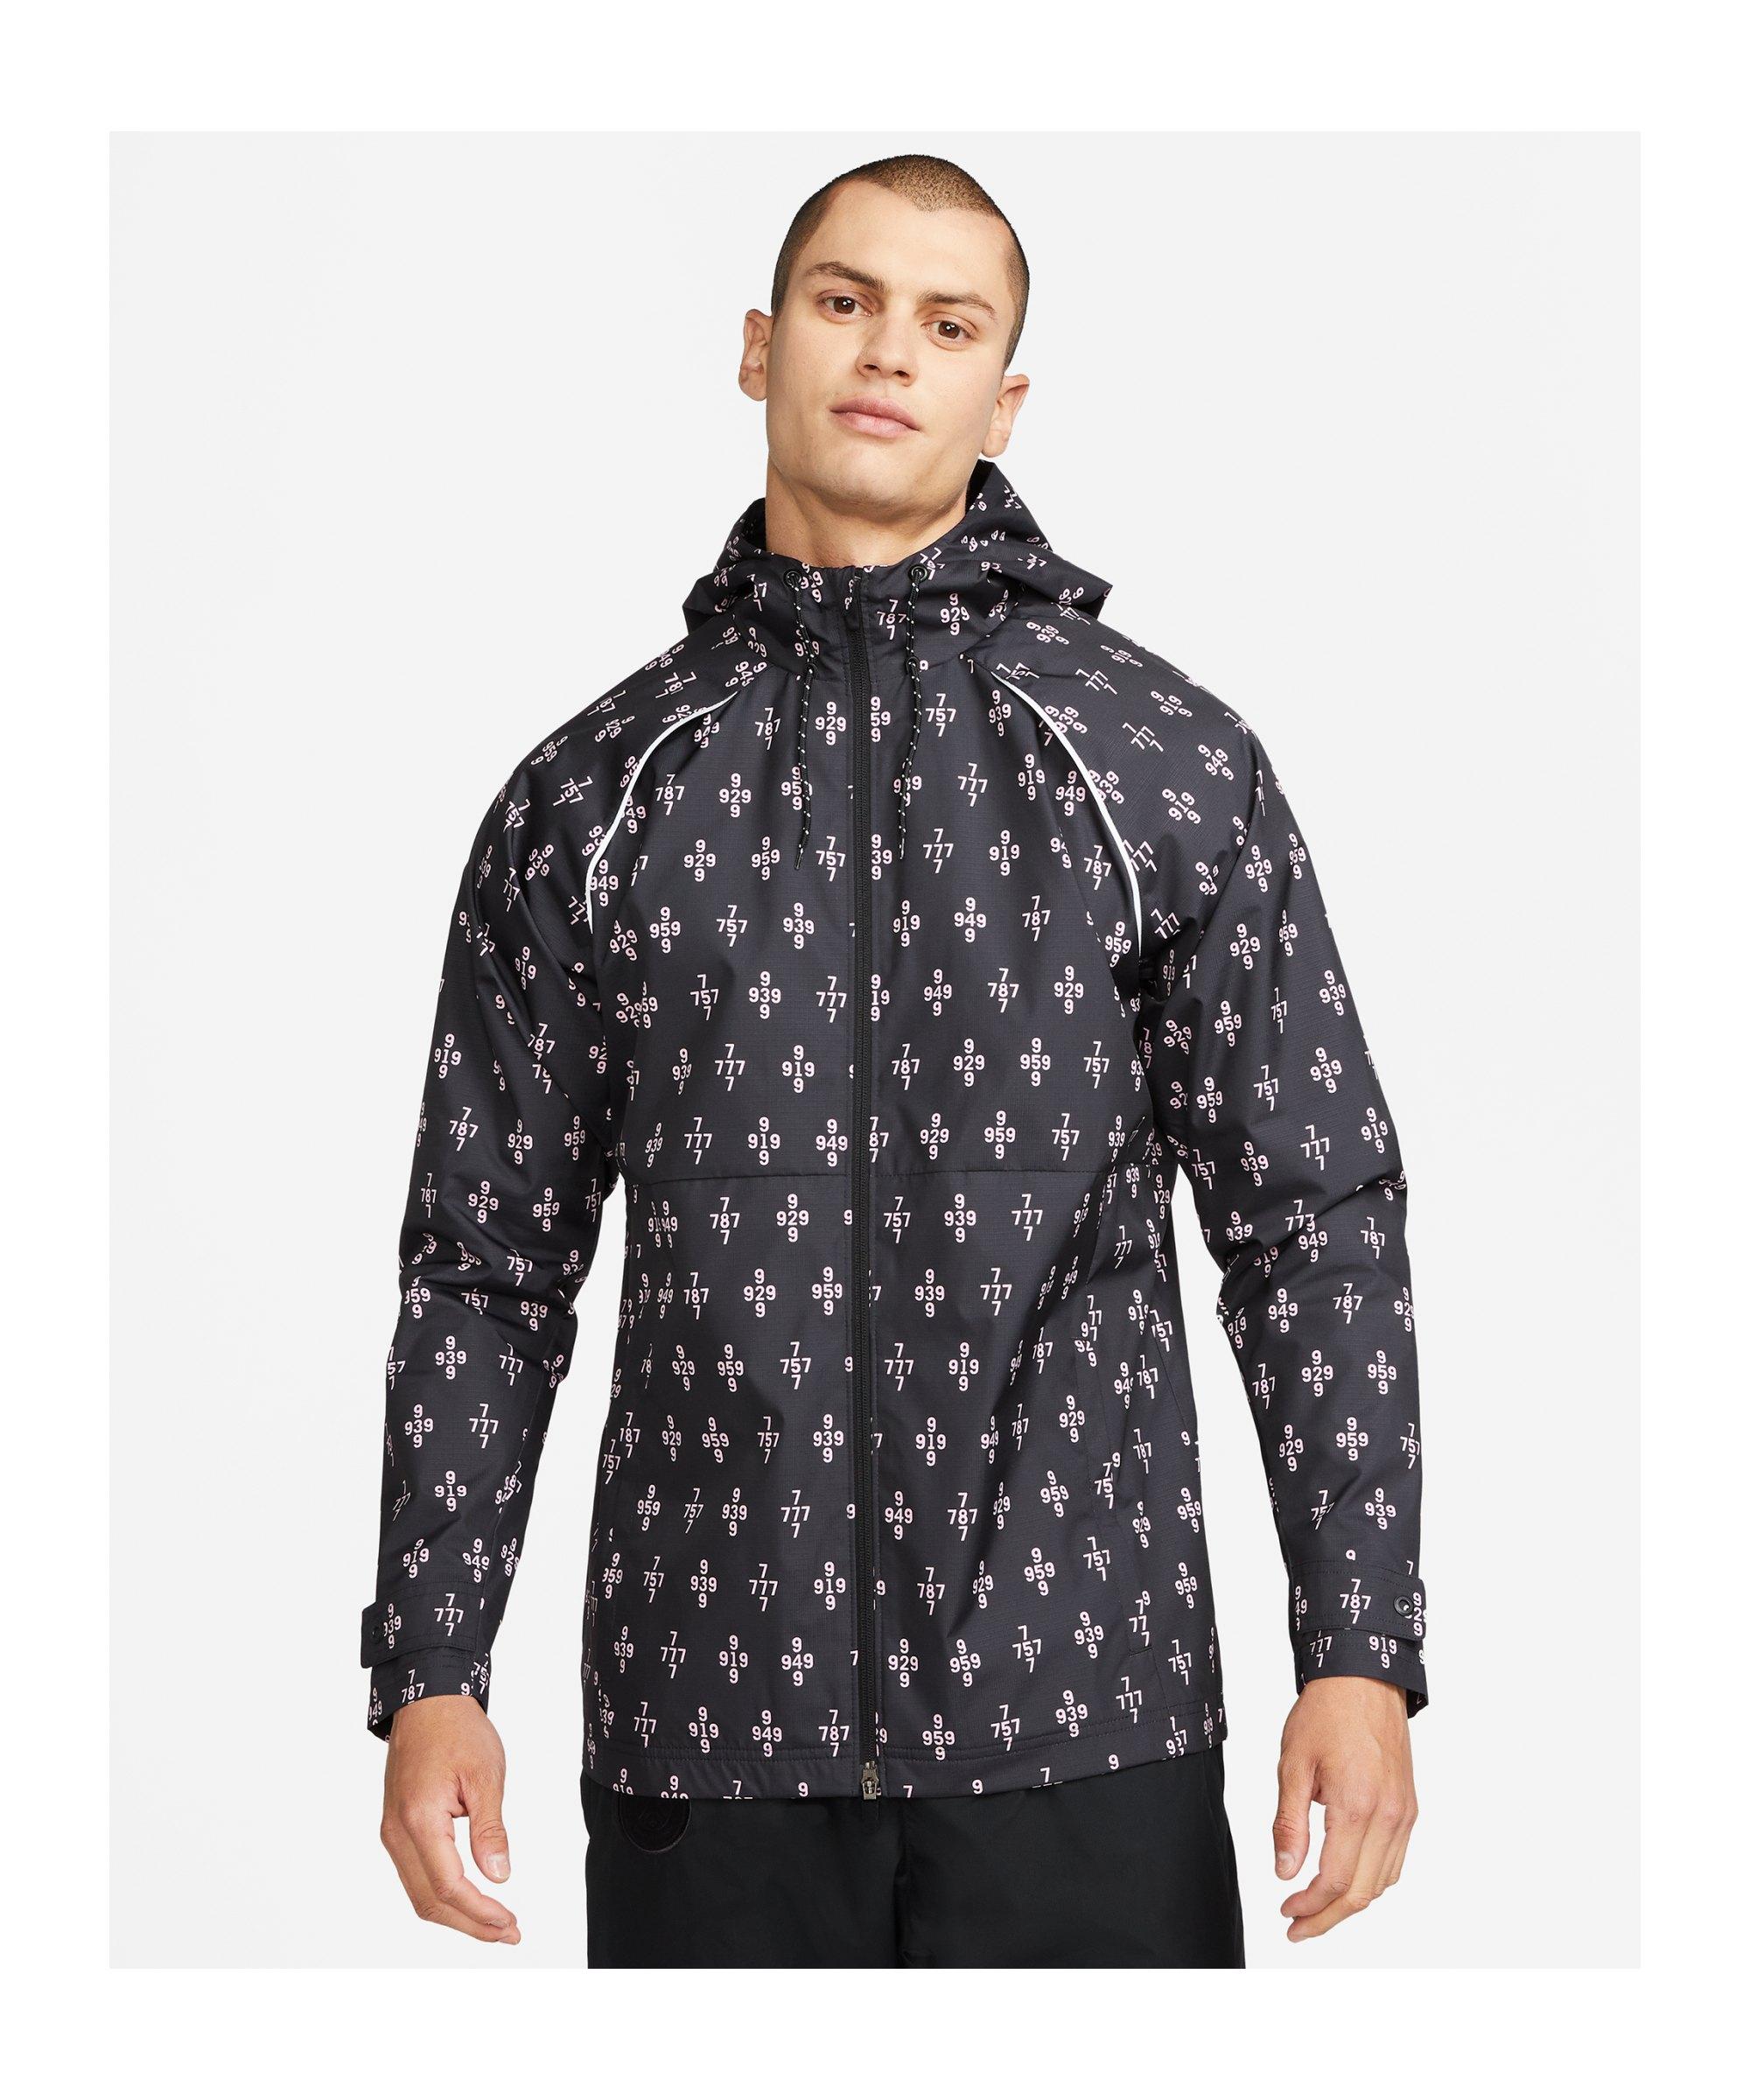 Nike Paris St. Germain Trainingsjacke Schwarz F010 - schwarz